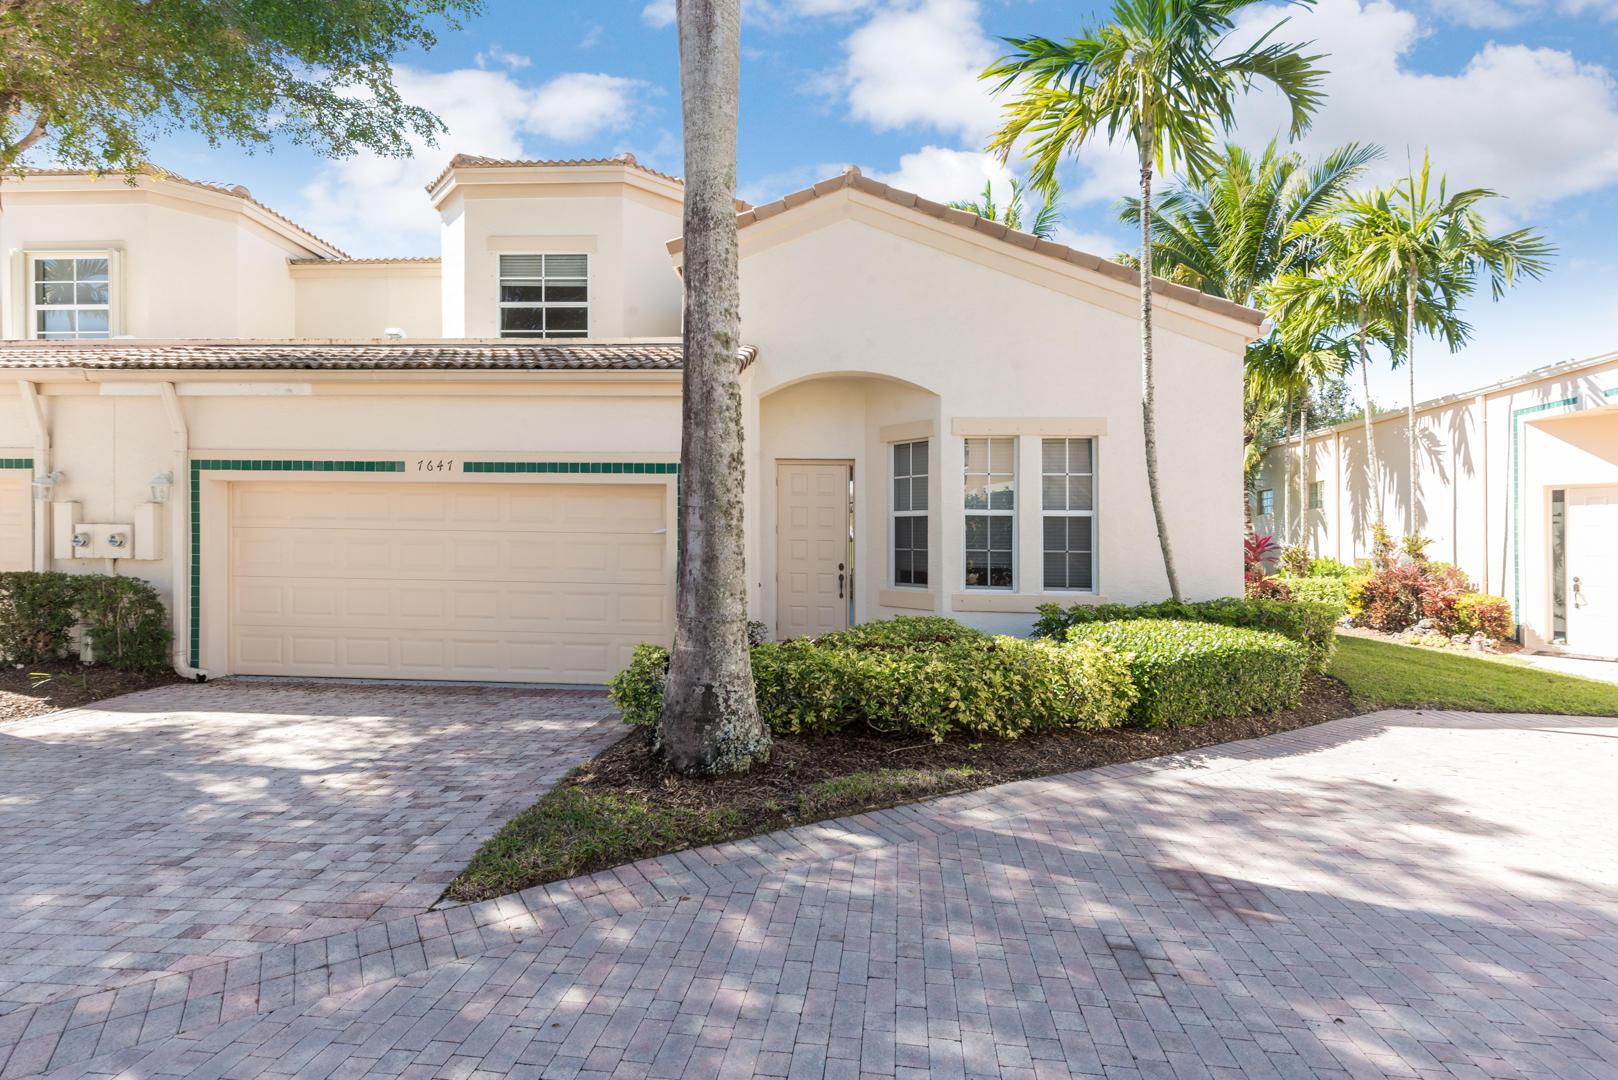 7647 Gumbo Limbo Court, West Palm Beach, Florida 33412, 3 Bedrooms Bedrooms, ,2.1 BathroomsBathrooms,A,Townhouse,Gumbo Limbo,RX-10598102